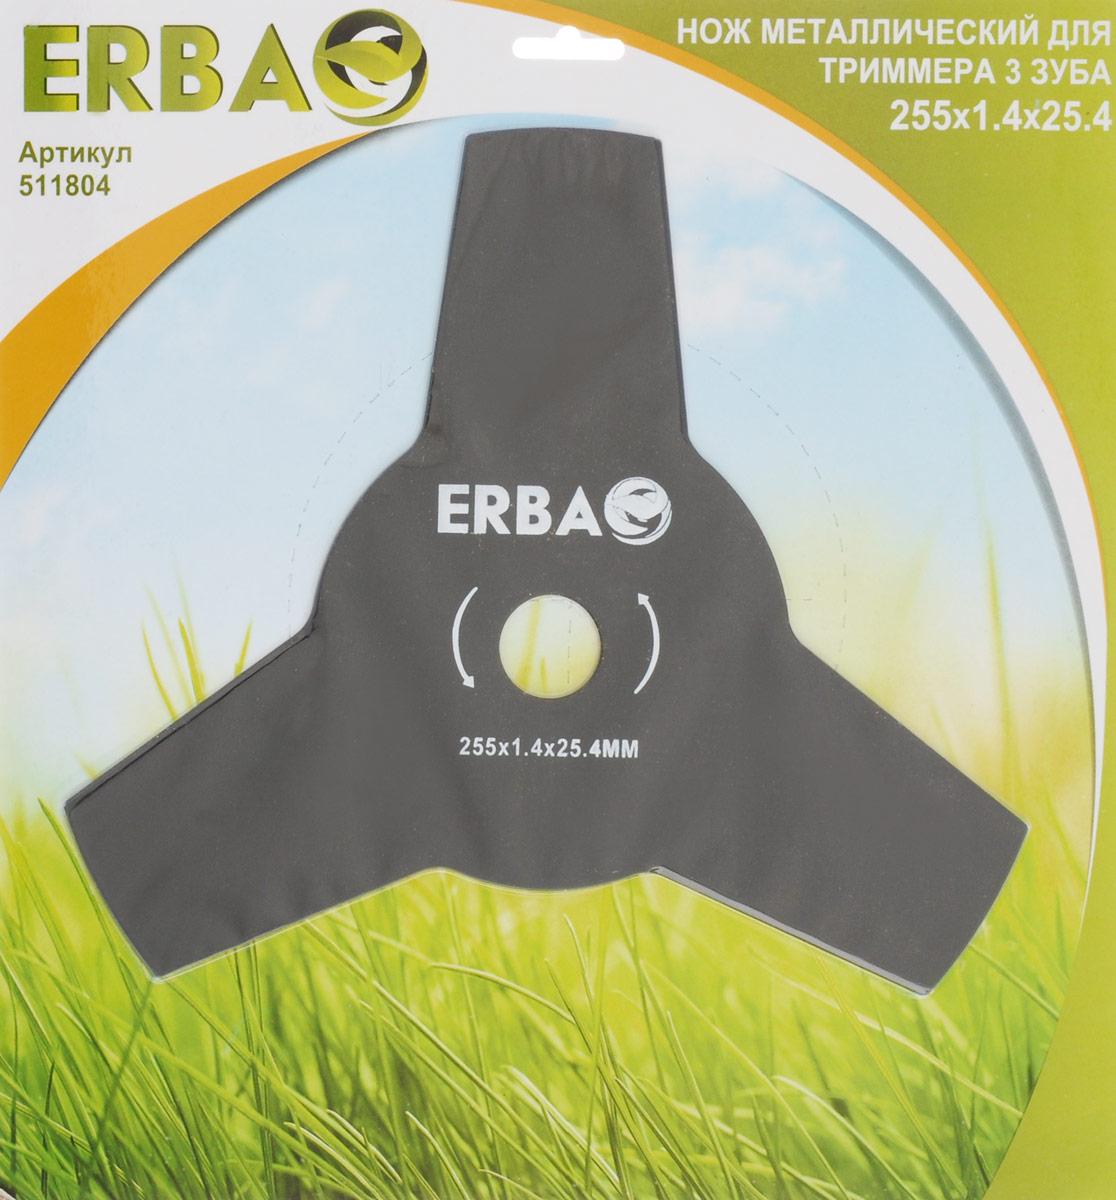 Нож для триммера Erba, диаметр 255 мм, толщина 1,4 мм нож champion для жесткой травы c5120 c774